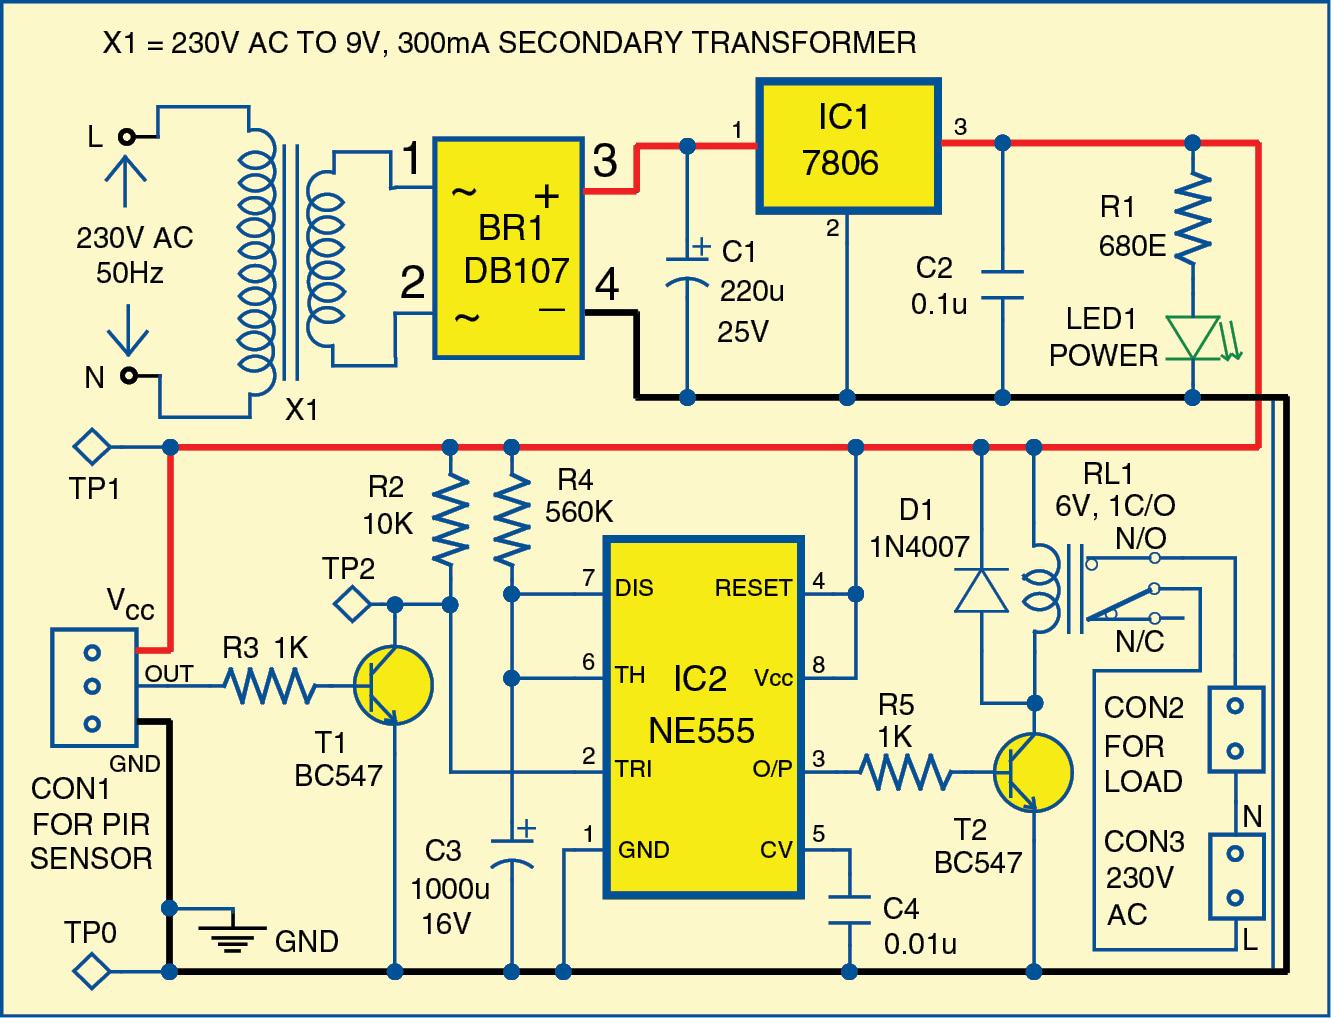 Home Security Alarm2 further 334955291007175516 likewise Pir Sensor 2wire Wiring Diagram likewise Pir Motion Detector Circuit Diagram as well Sensor Wiring Schematic. on pir motion sensor circuit diagram 7